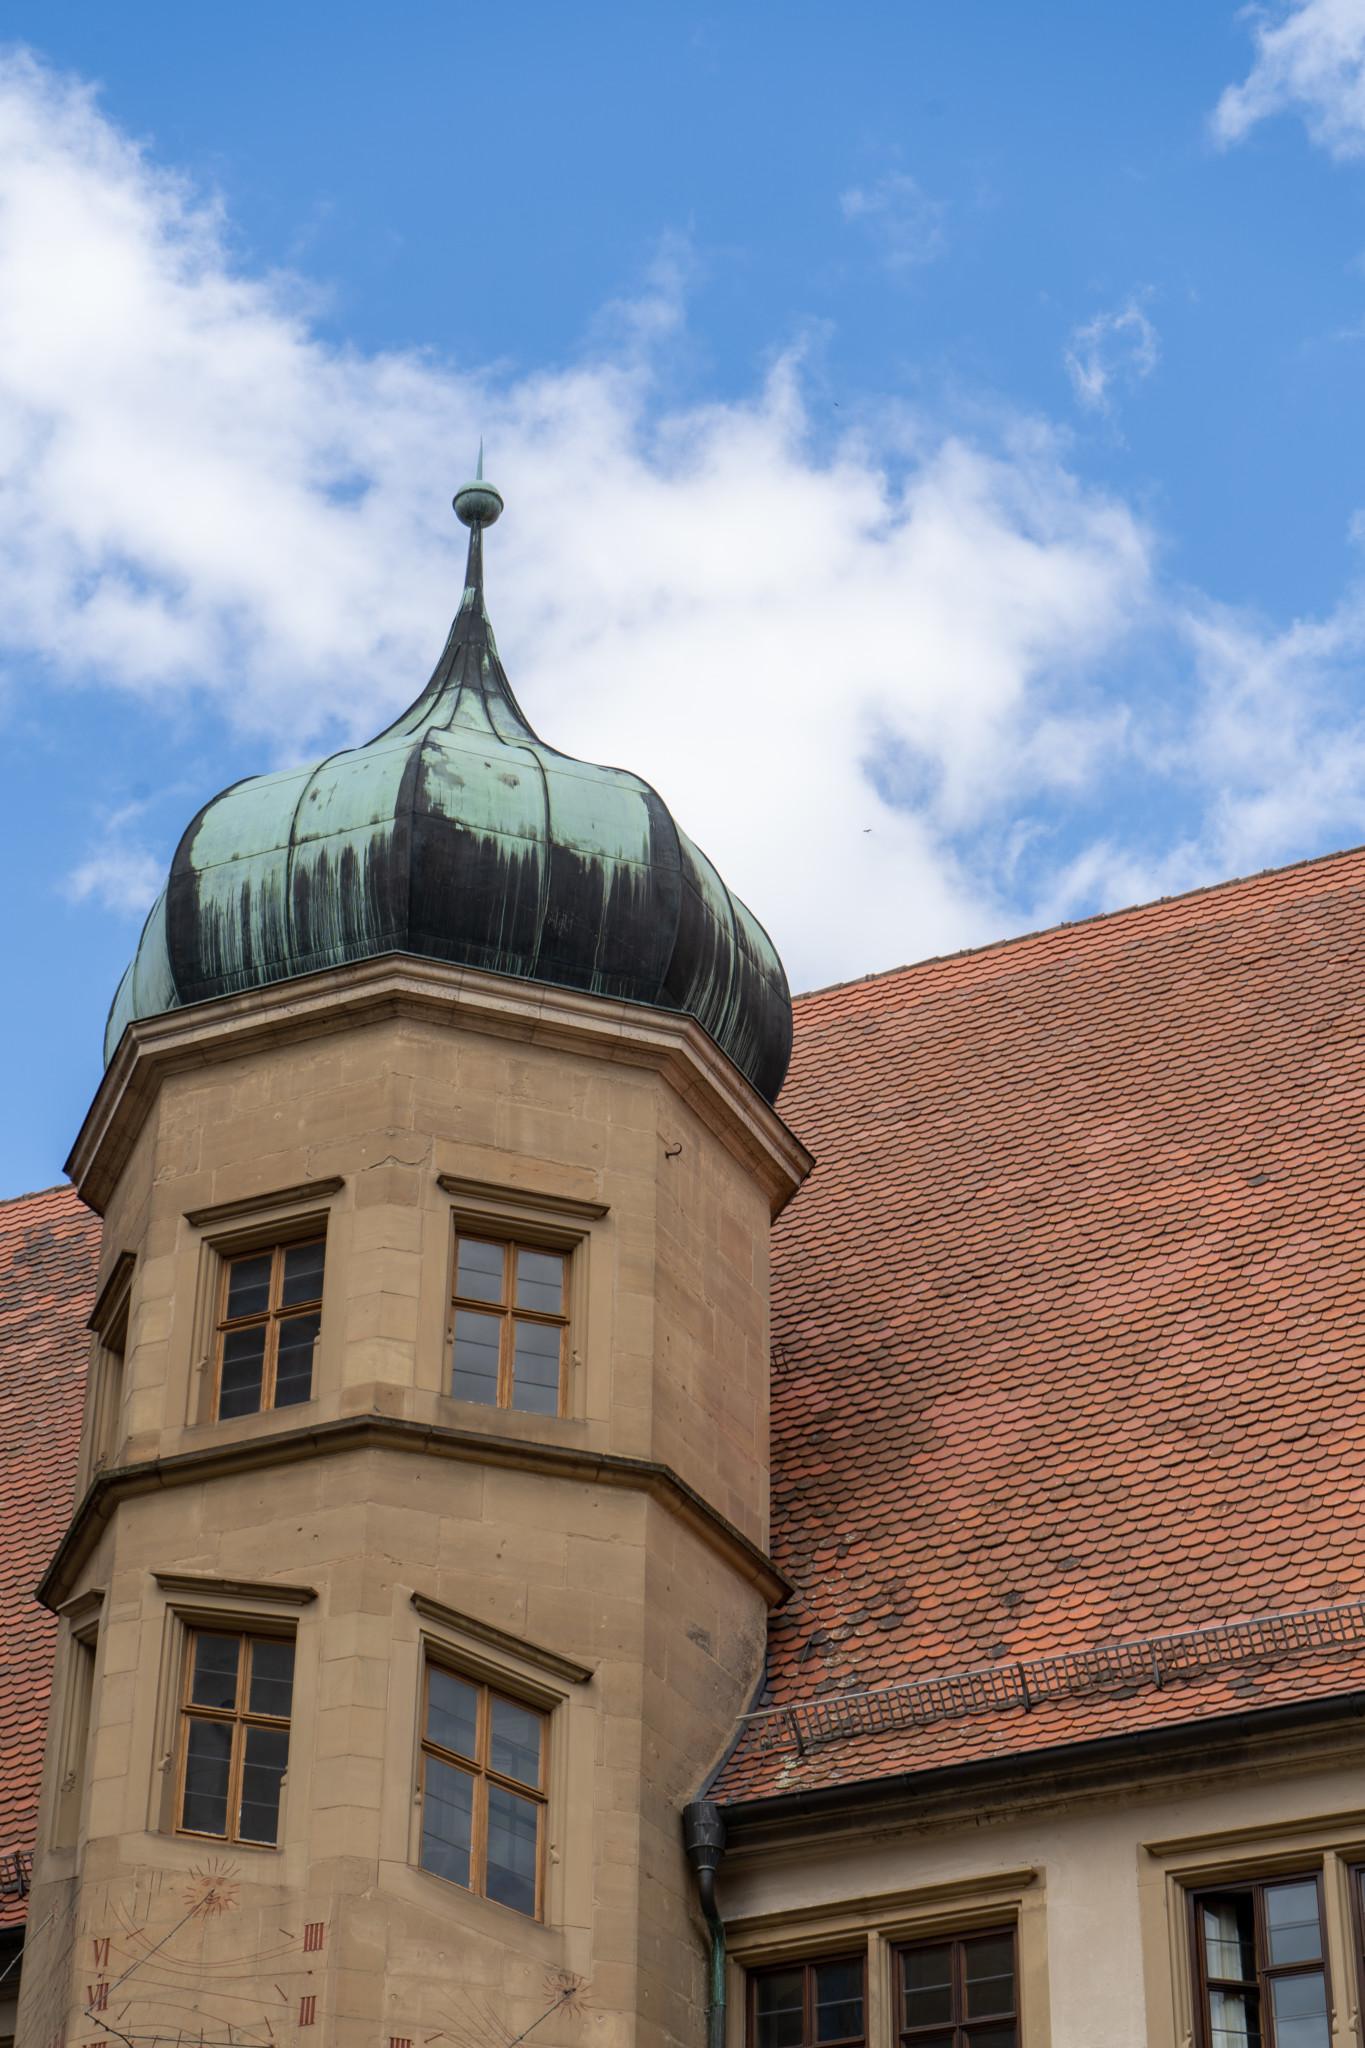 St. Jakobskirche in Rothenburg ob der Tauber